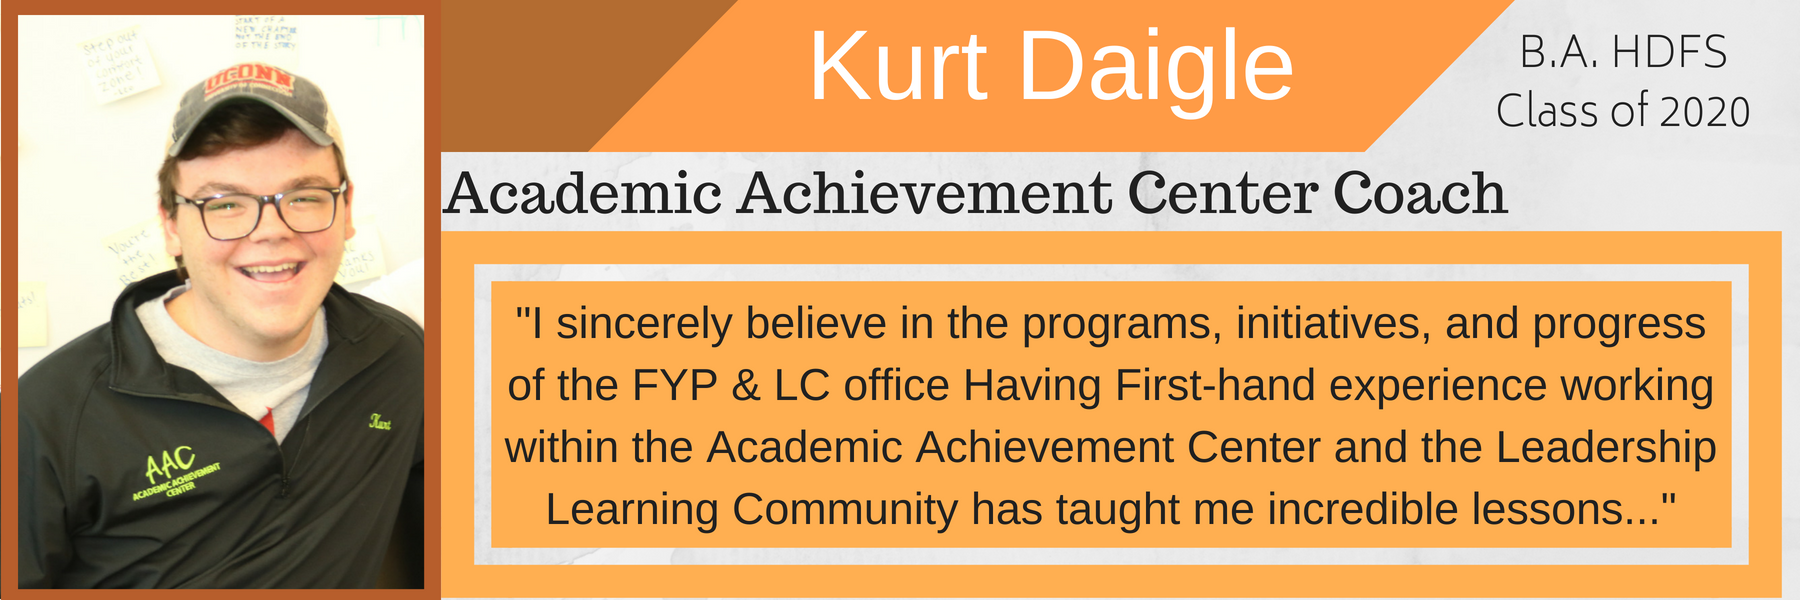 Kurt Daigle Why I mentor